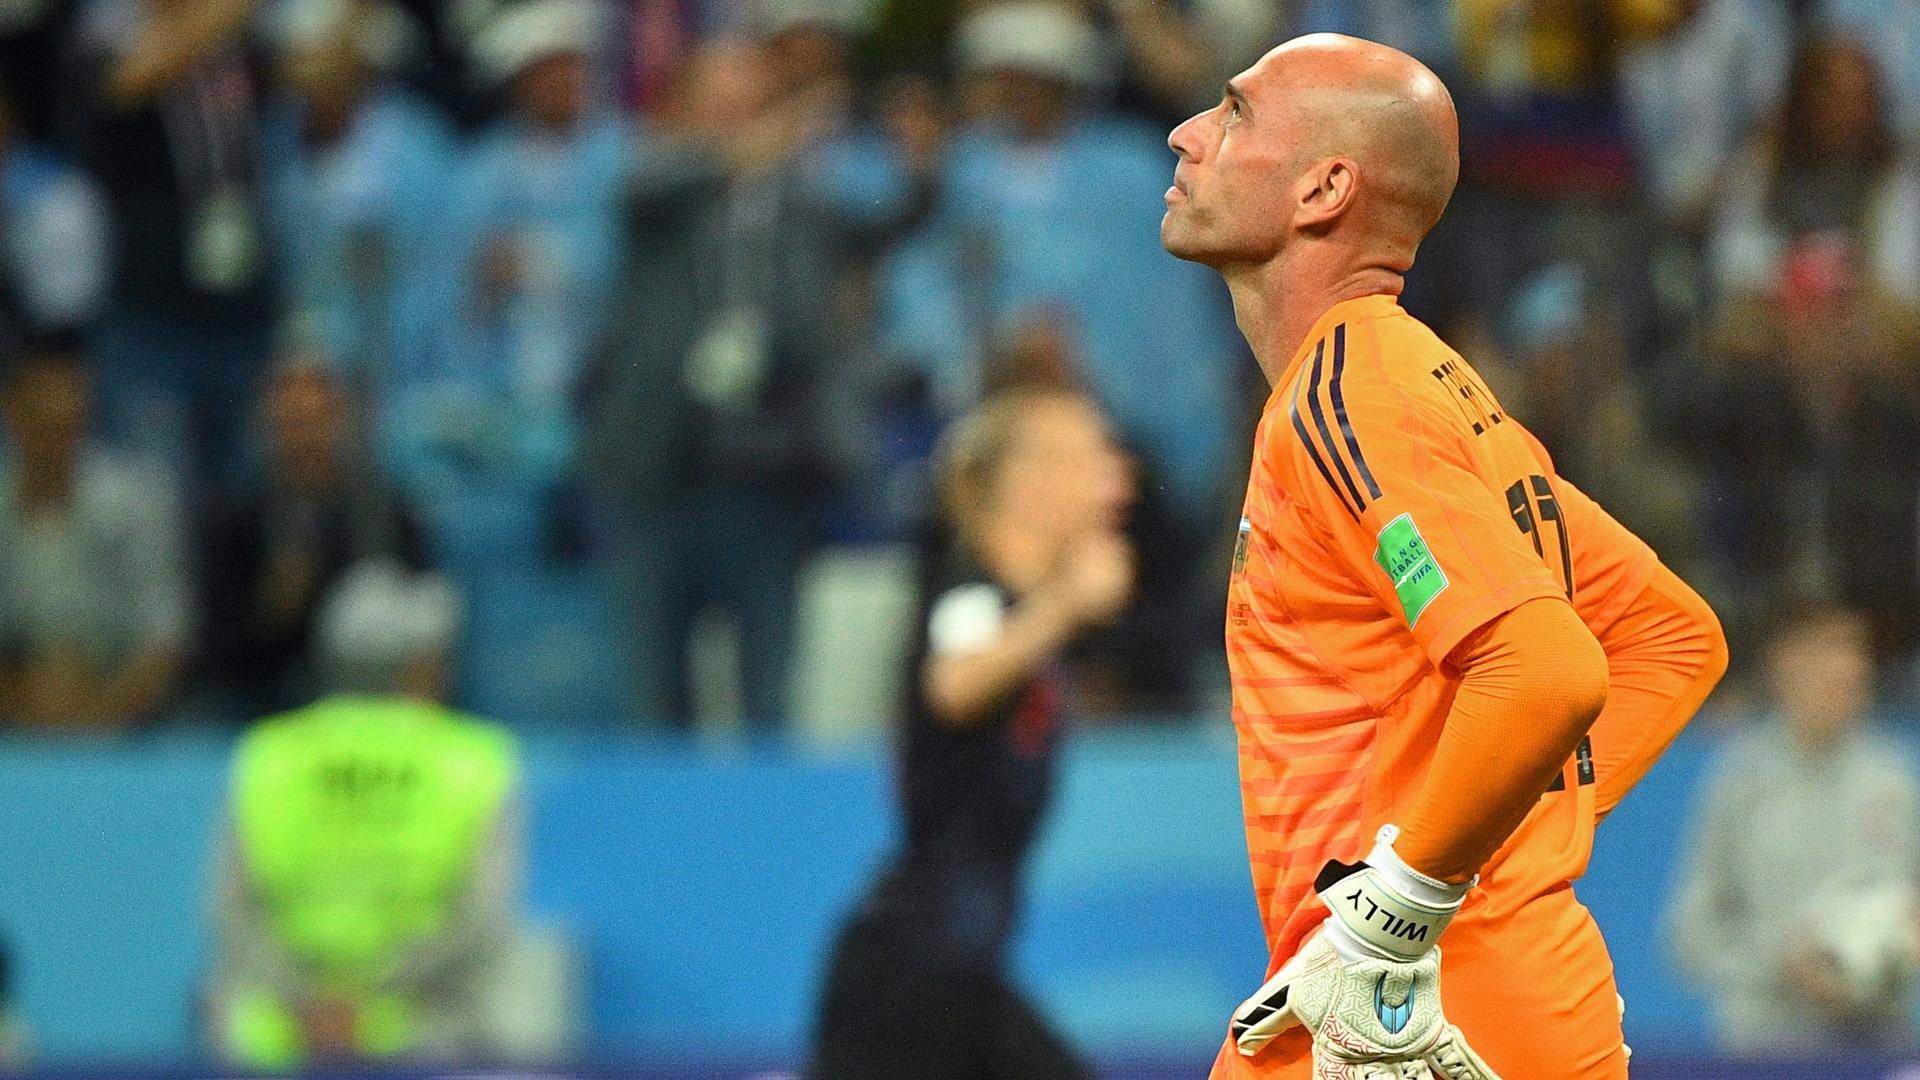 Willy Caballero sobre la derrota argentina: